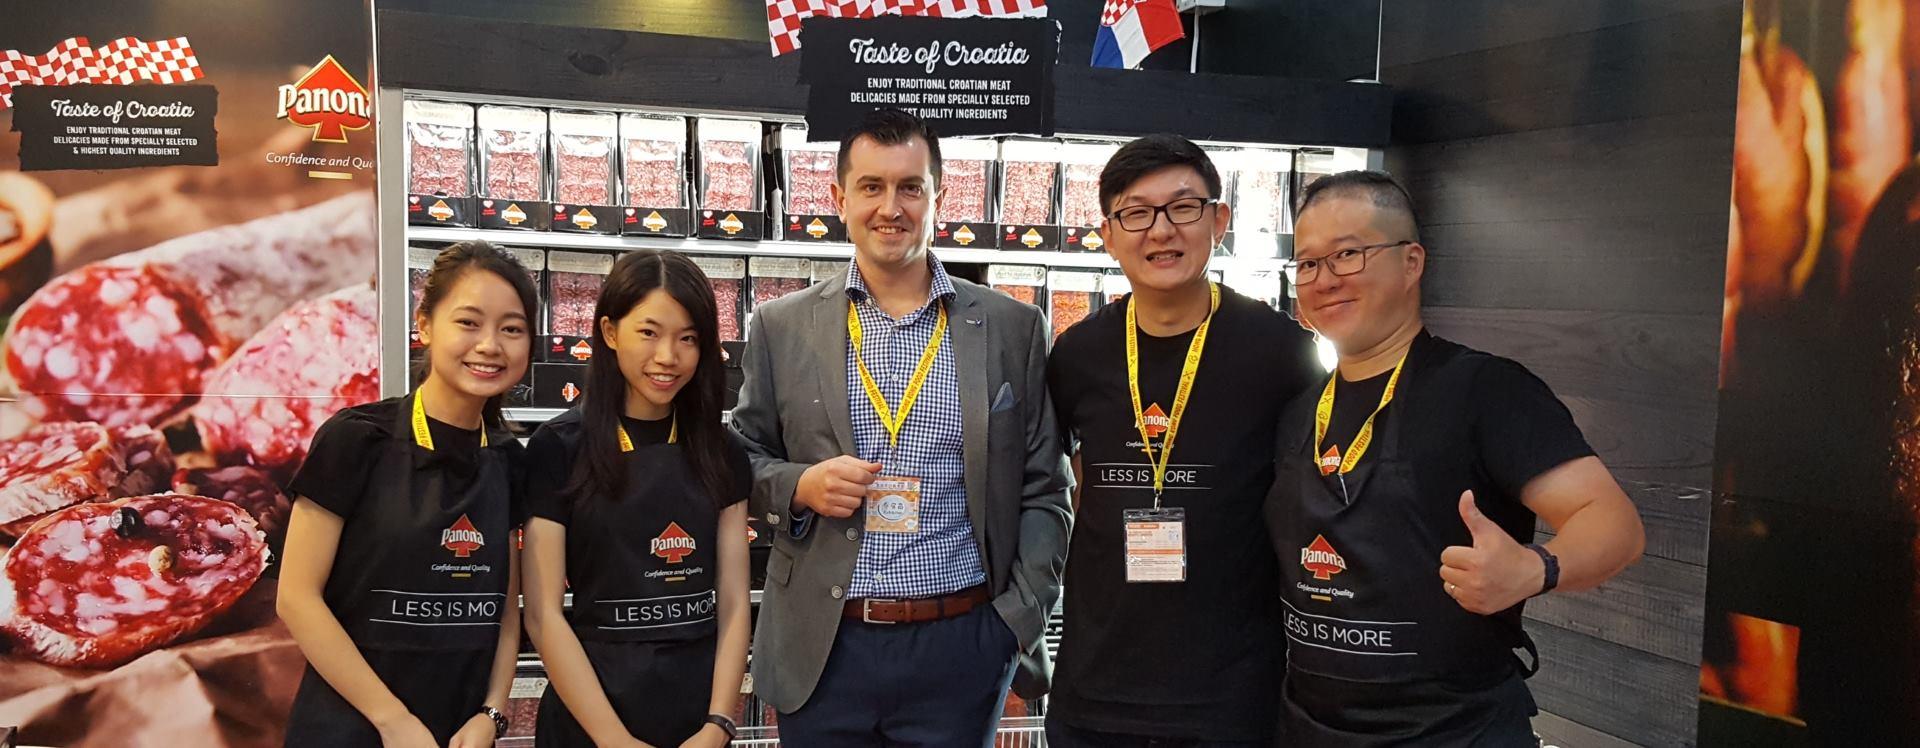 PIK Vrbovec i Belje predstavili autohtone proizvode na 14. Hong Kong Food Festivalu